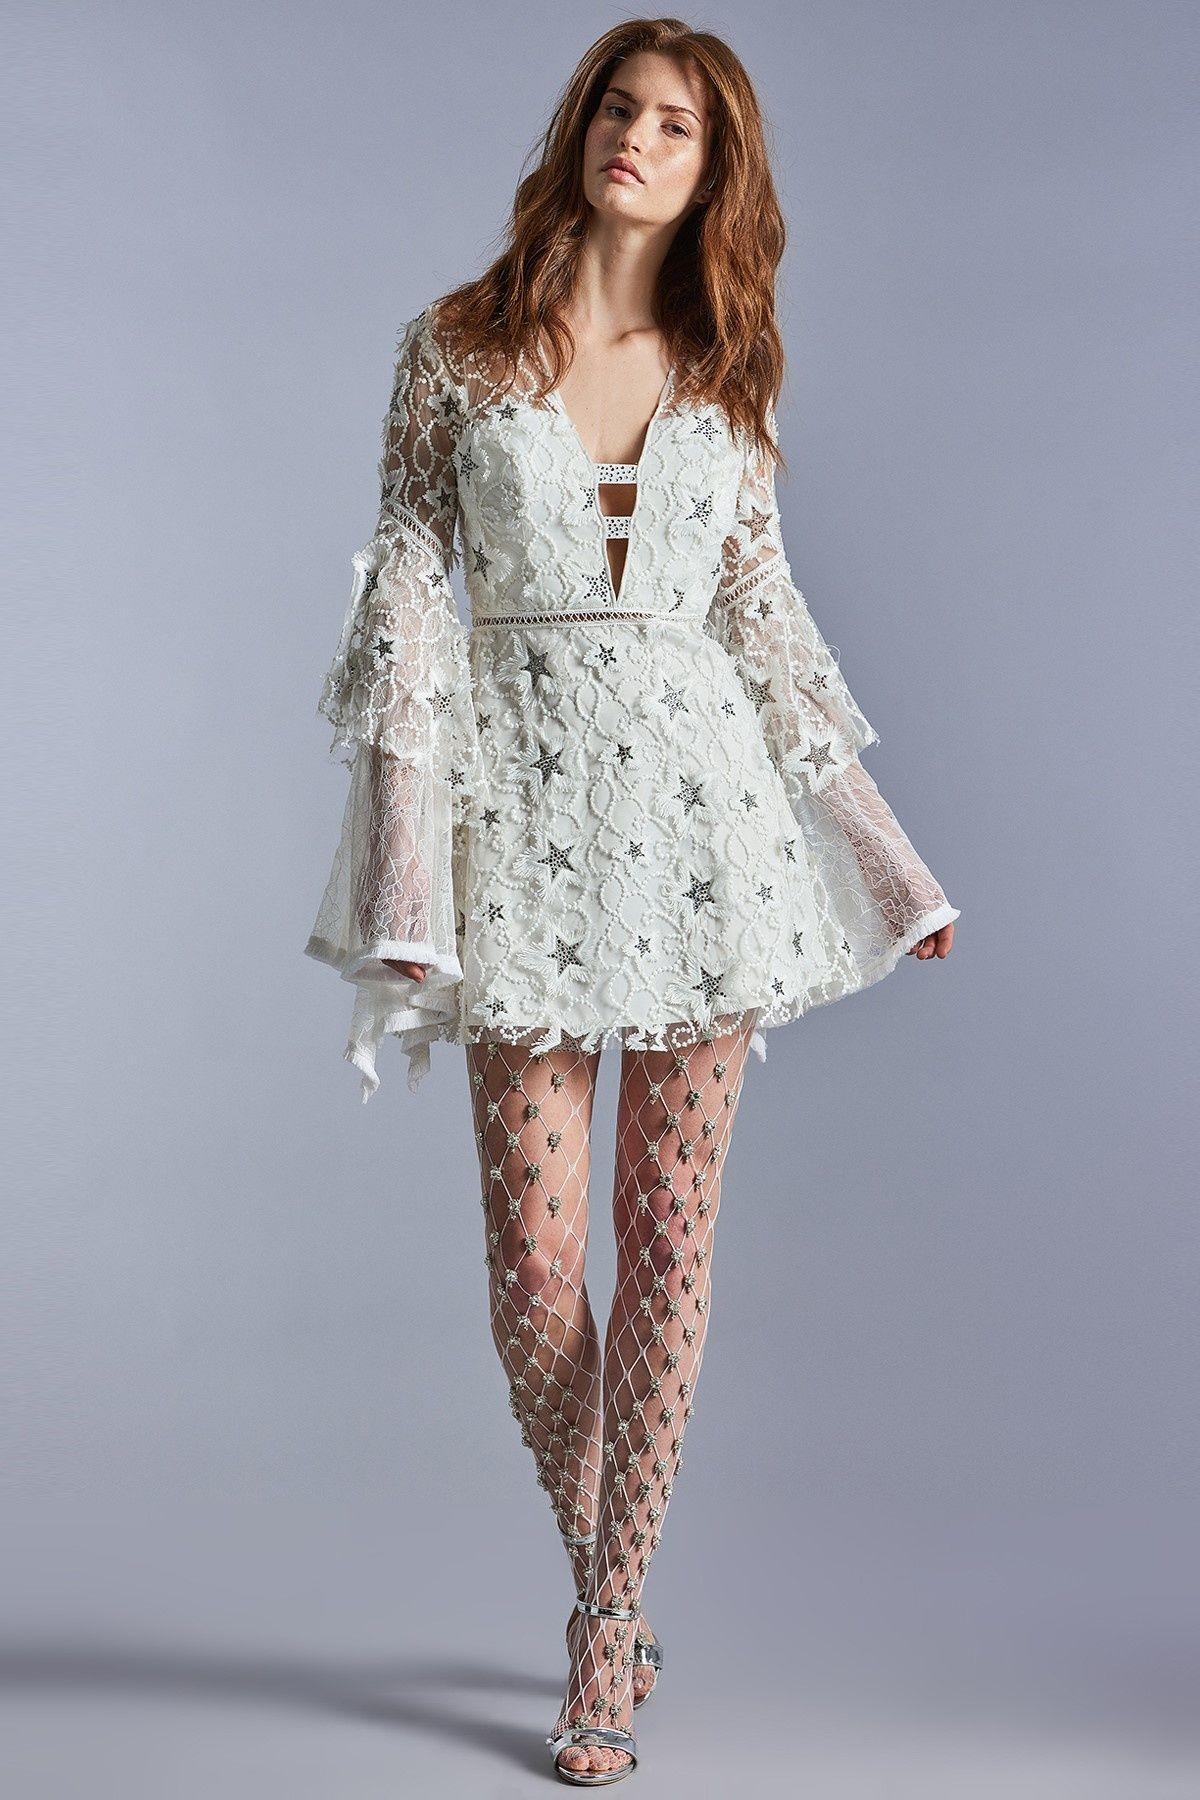 Celine Beyaz Tas Islemeli Elbise Raisa Vanessa For Trendyol Trendyol Elbise Kiyafet Mini Elbise